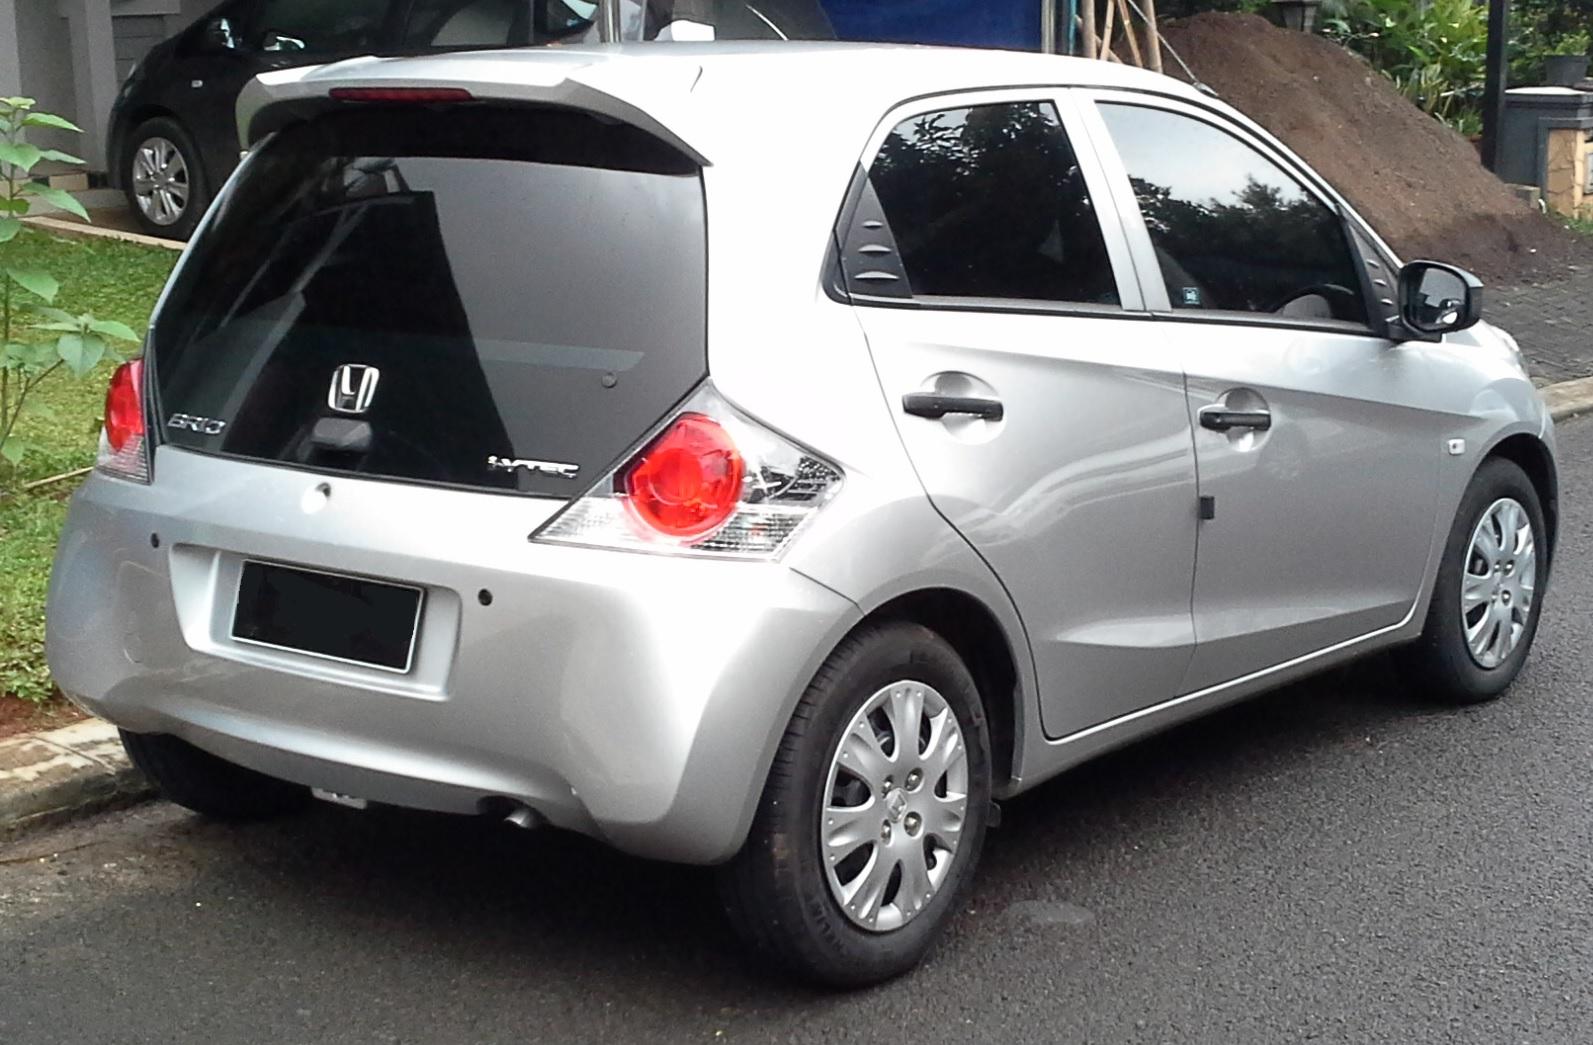 Duplikat Kunci Mobil Brio